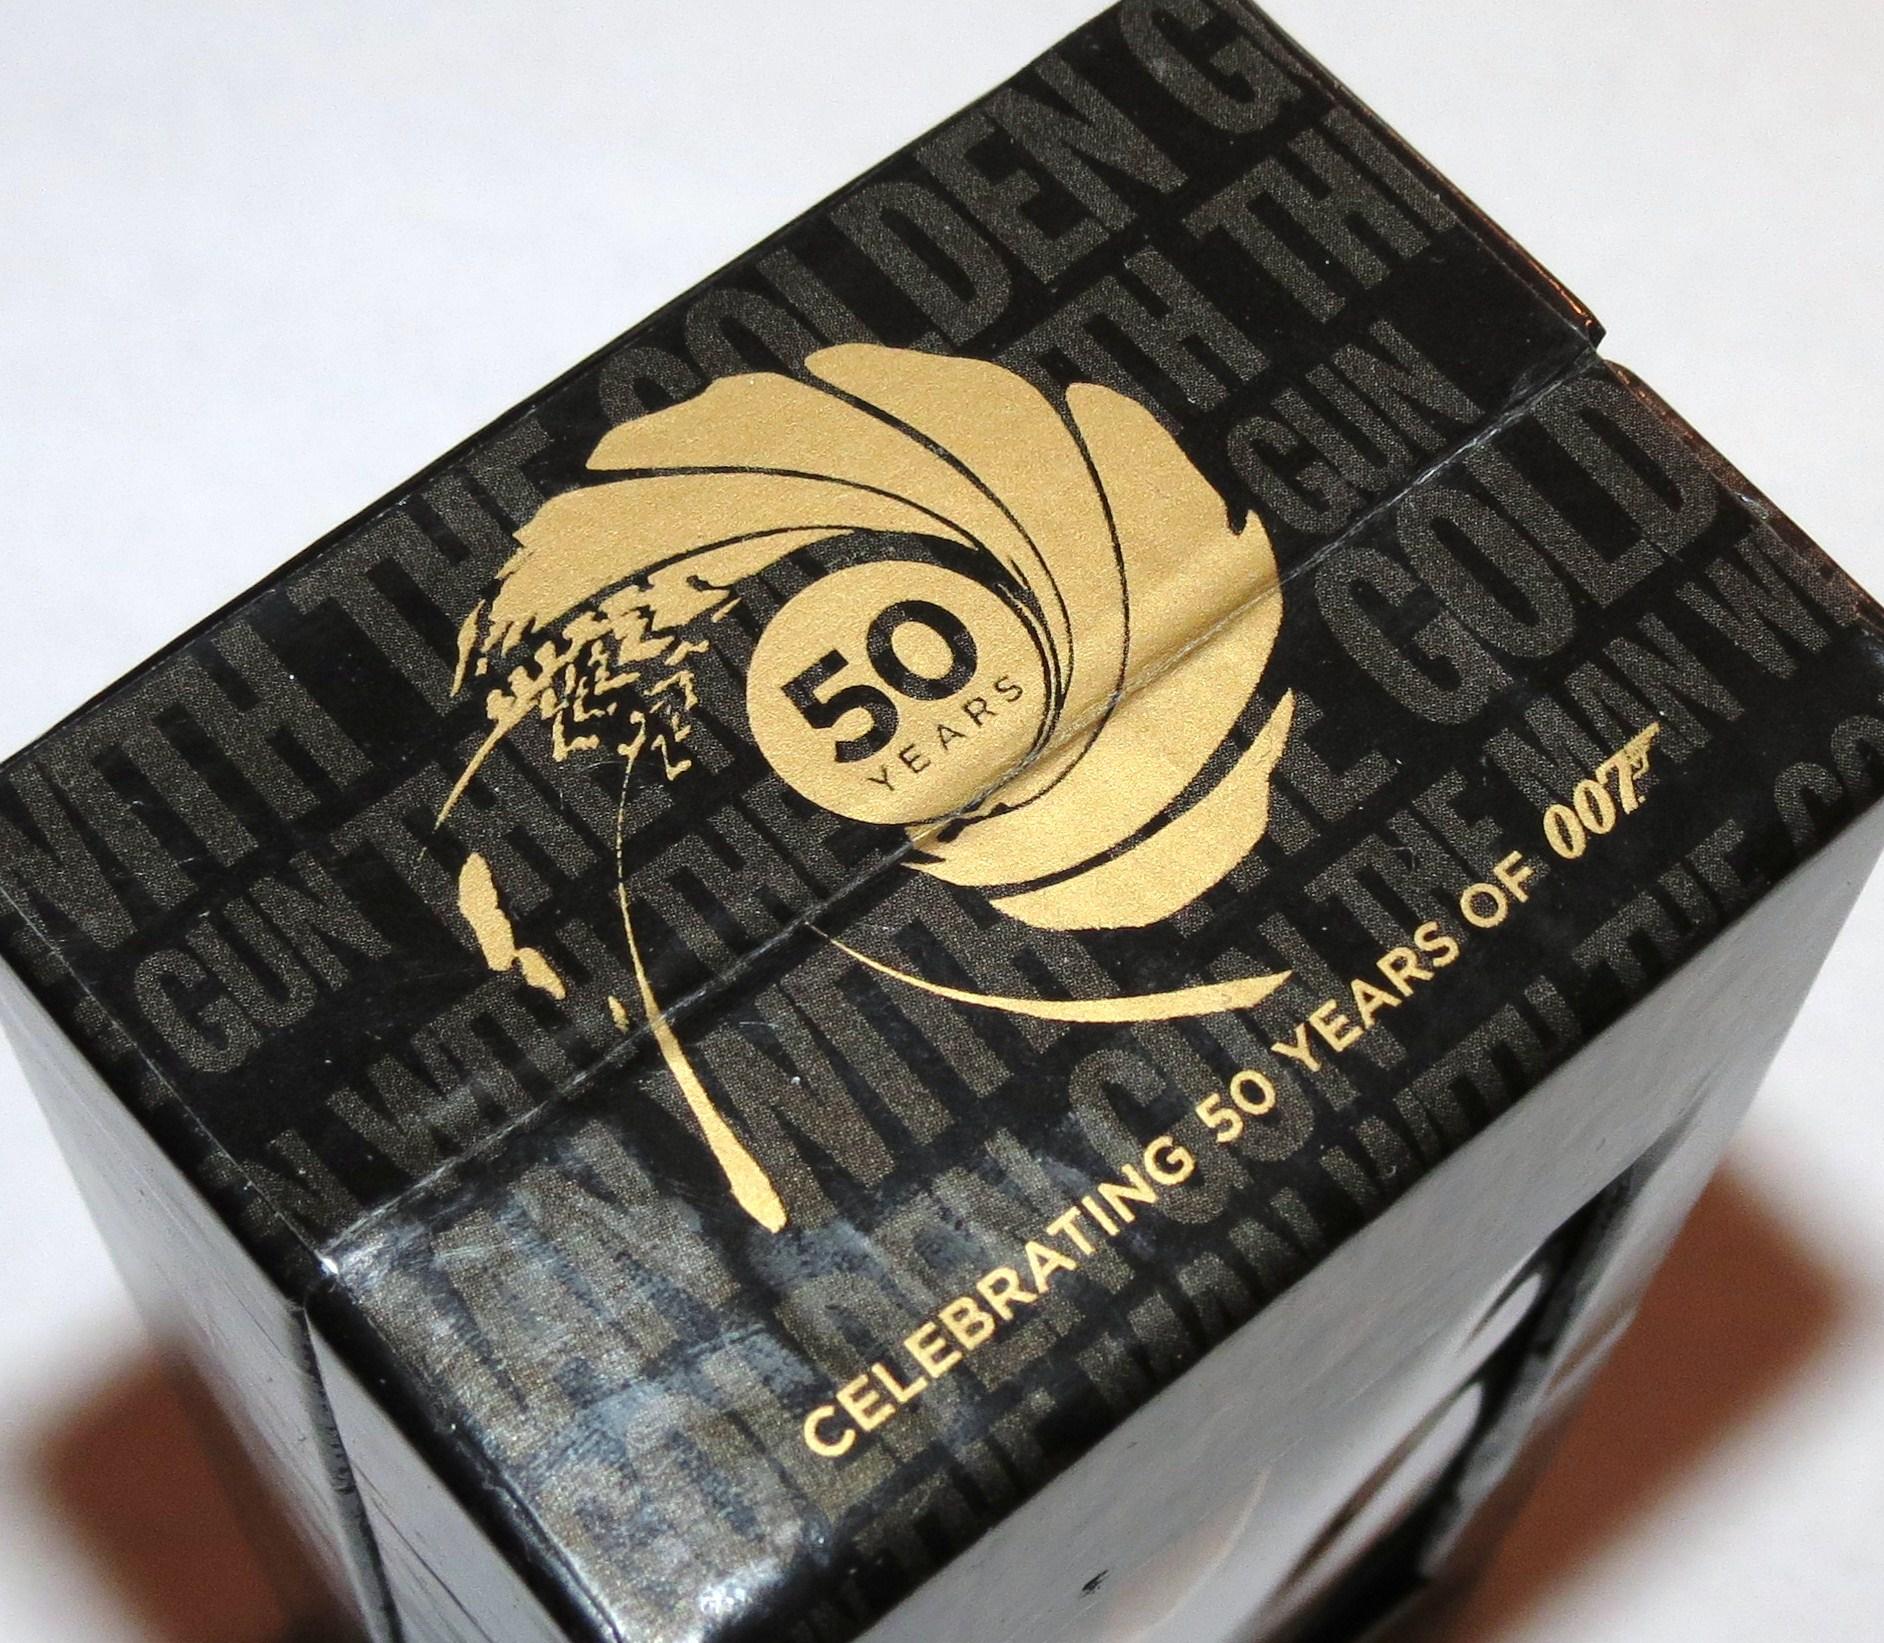 Opi The Man With The Golden Gun 18k Gold Leaf Nail Polish Top Coat